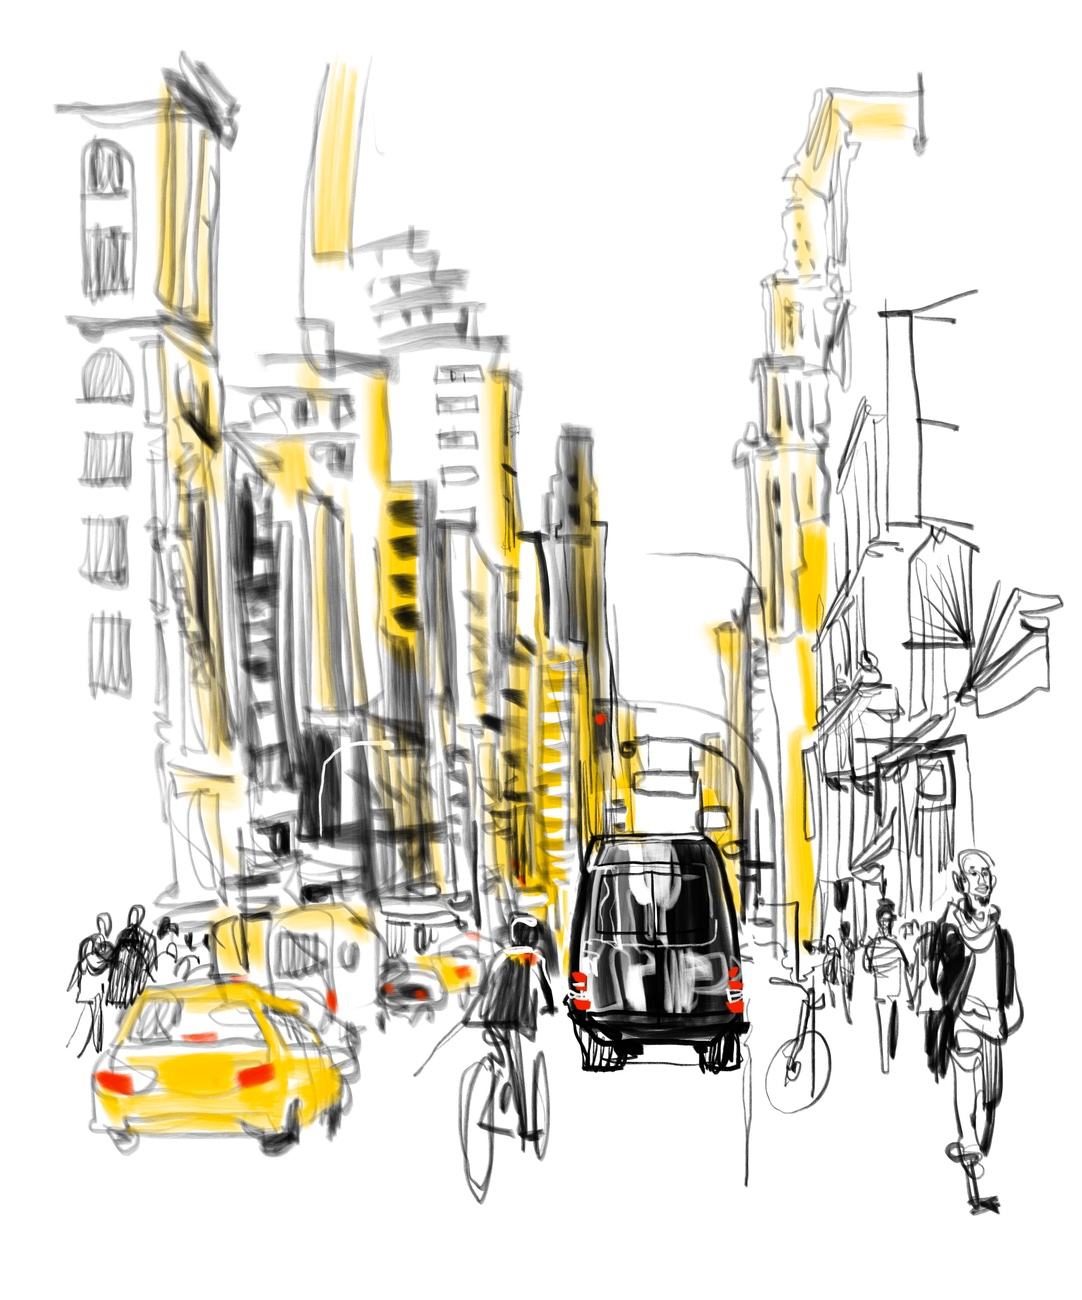 2018-NYC-12-Broadway_Sketcherman.jpg